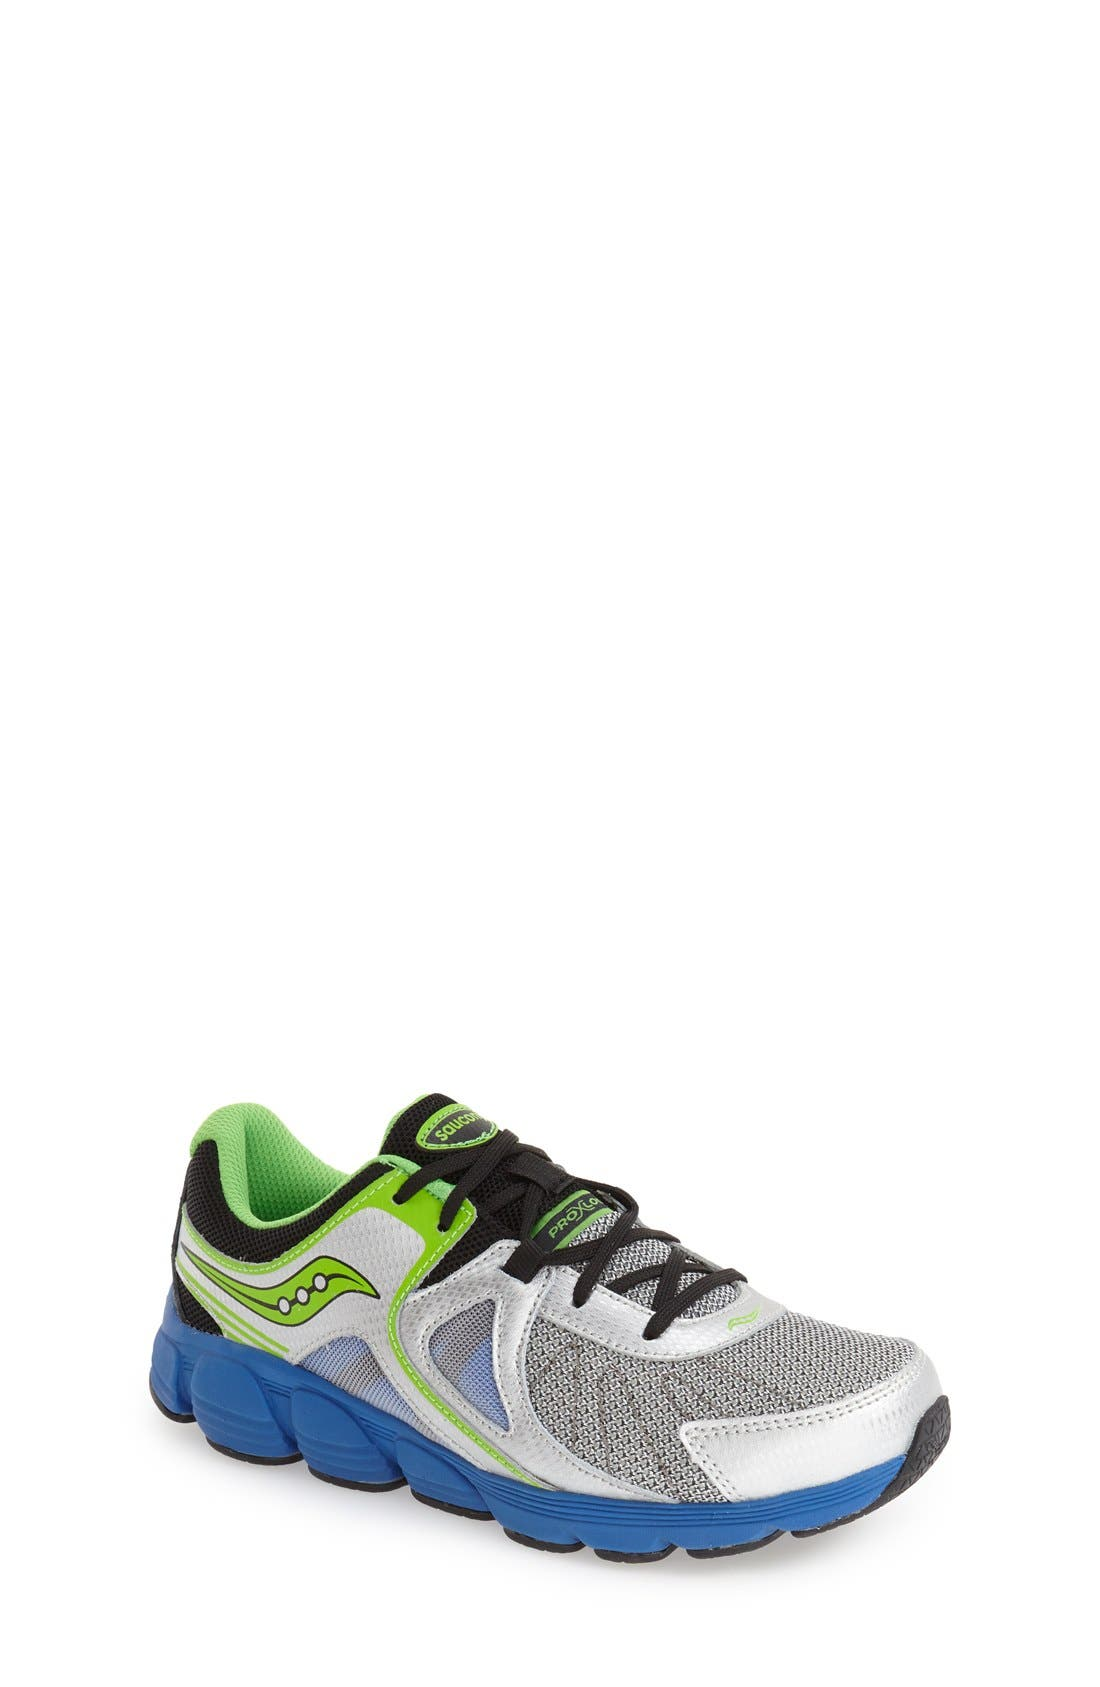 'Kotaro 3' Athletic Sneaker,                             Main thumbnail 1, color,                             040